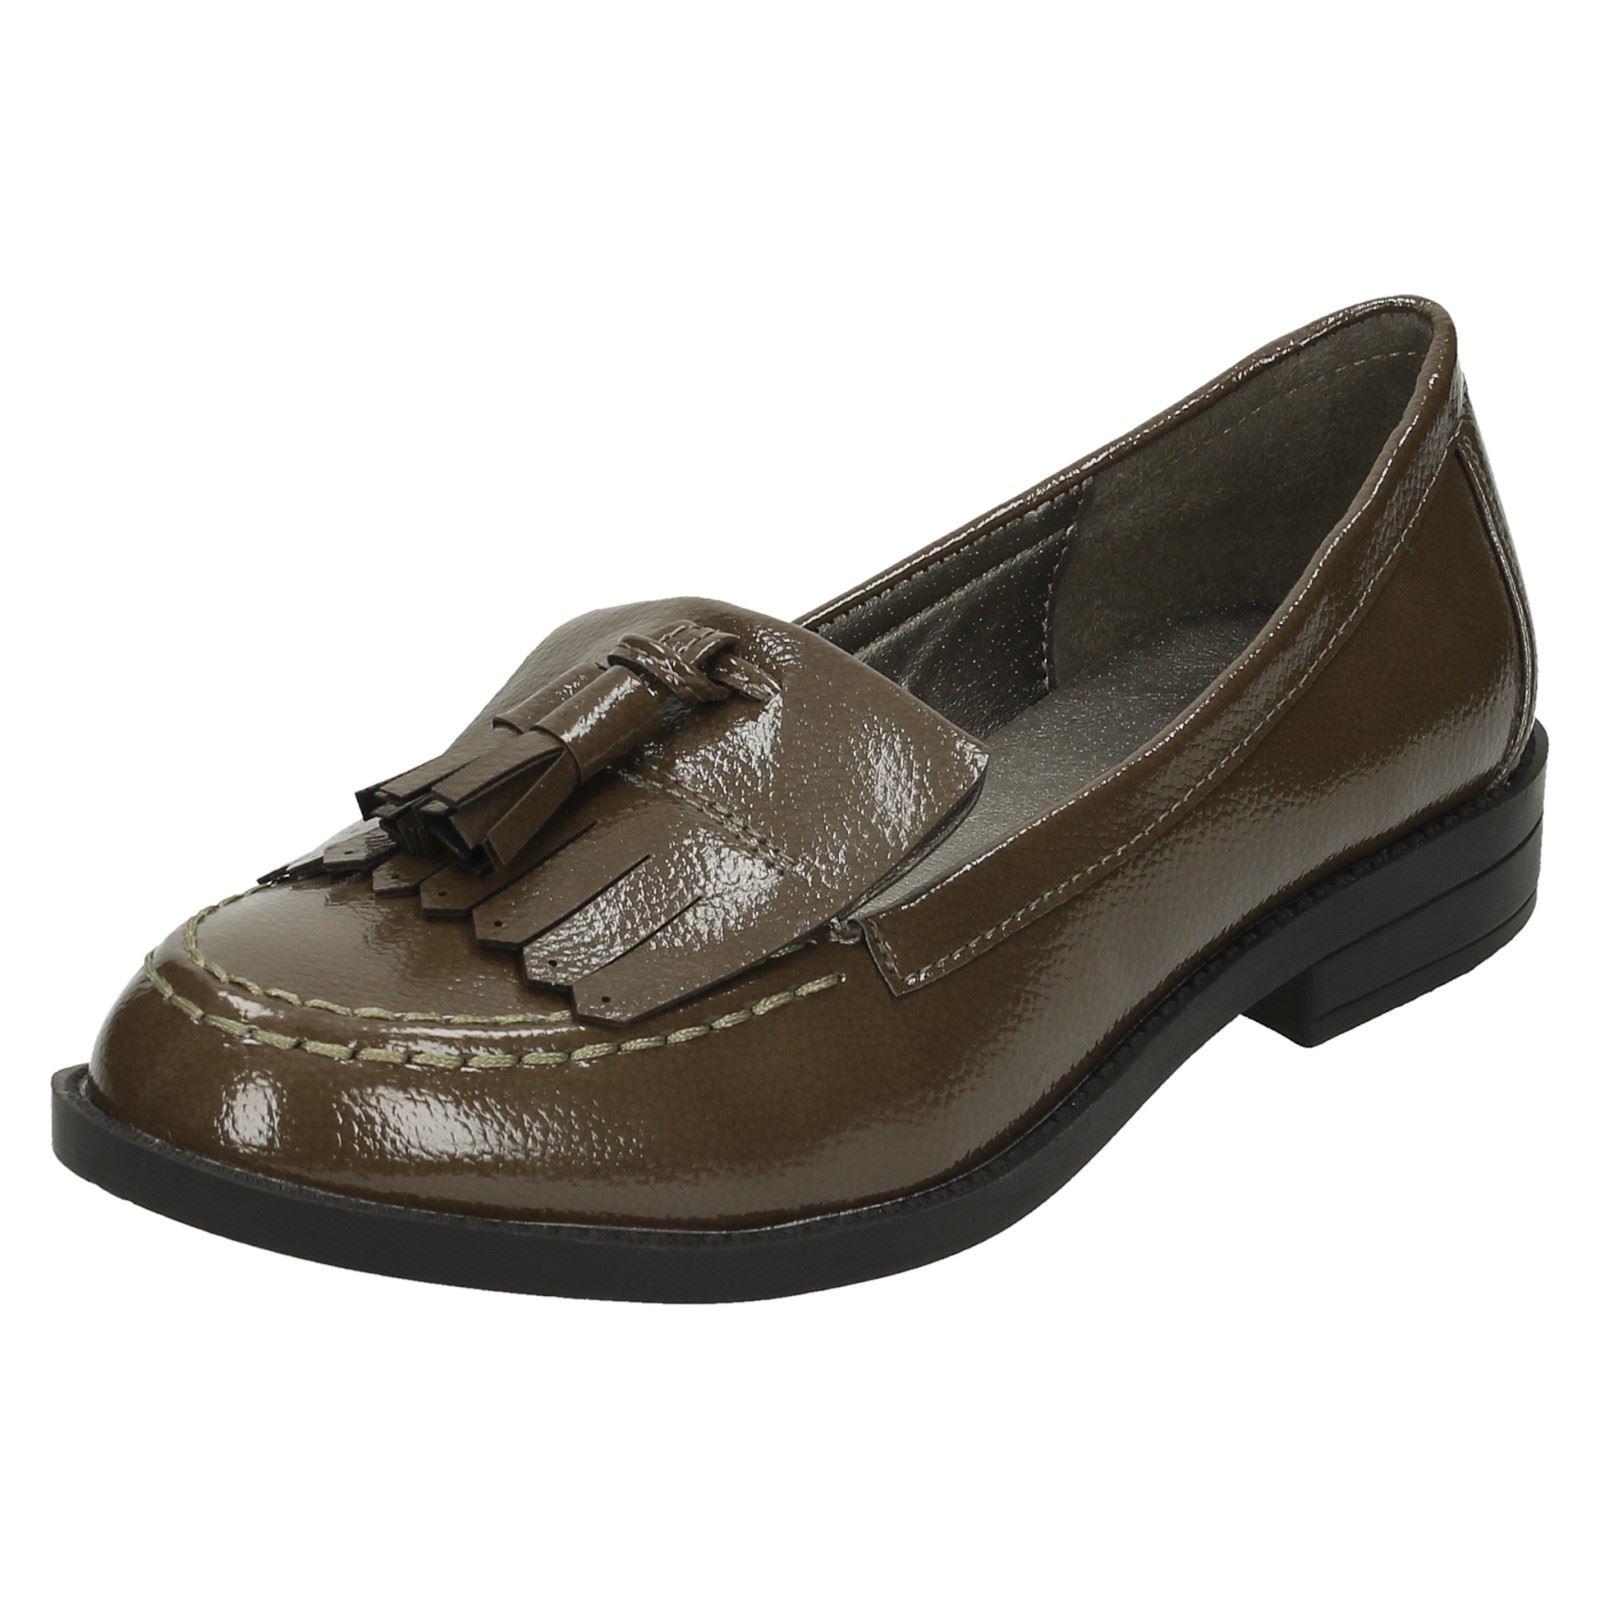 Mujer Spot On   Zapatos  On Estilo -f8r546 7e3aef